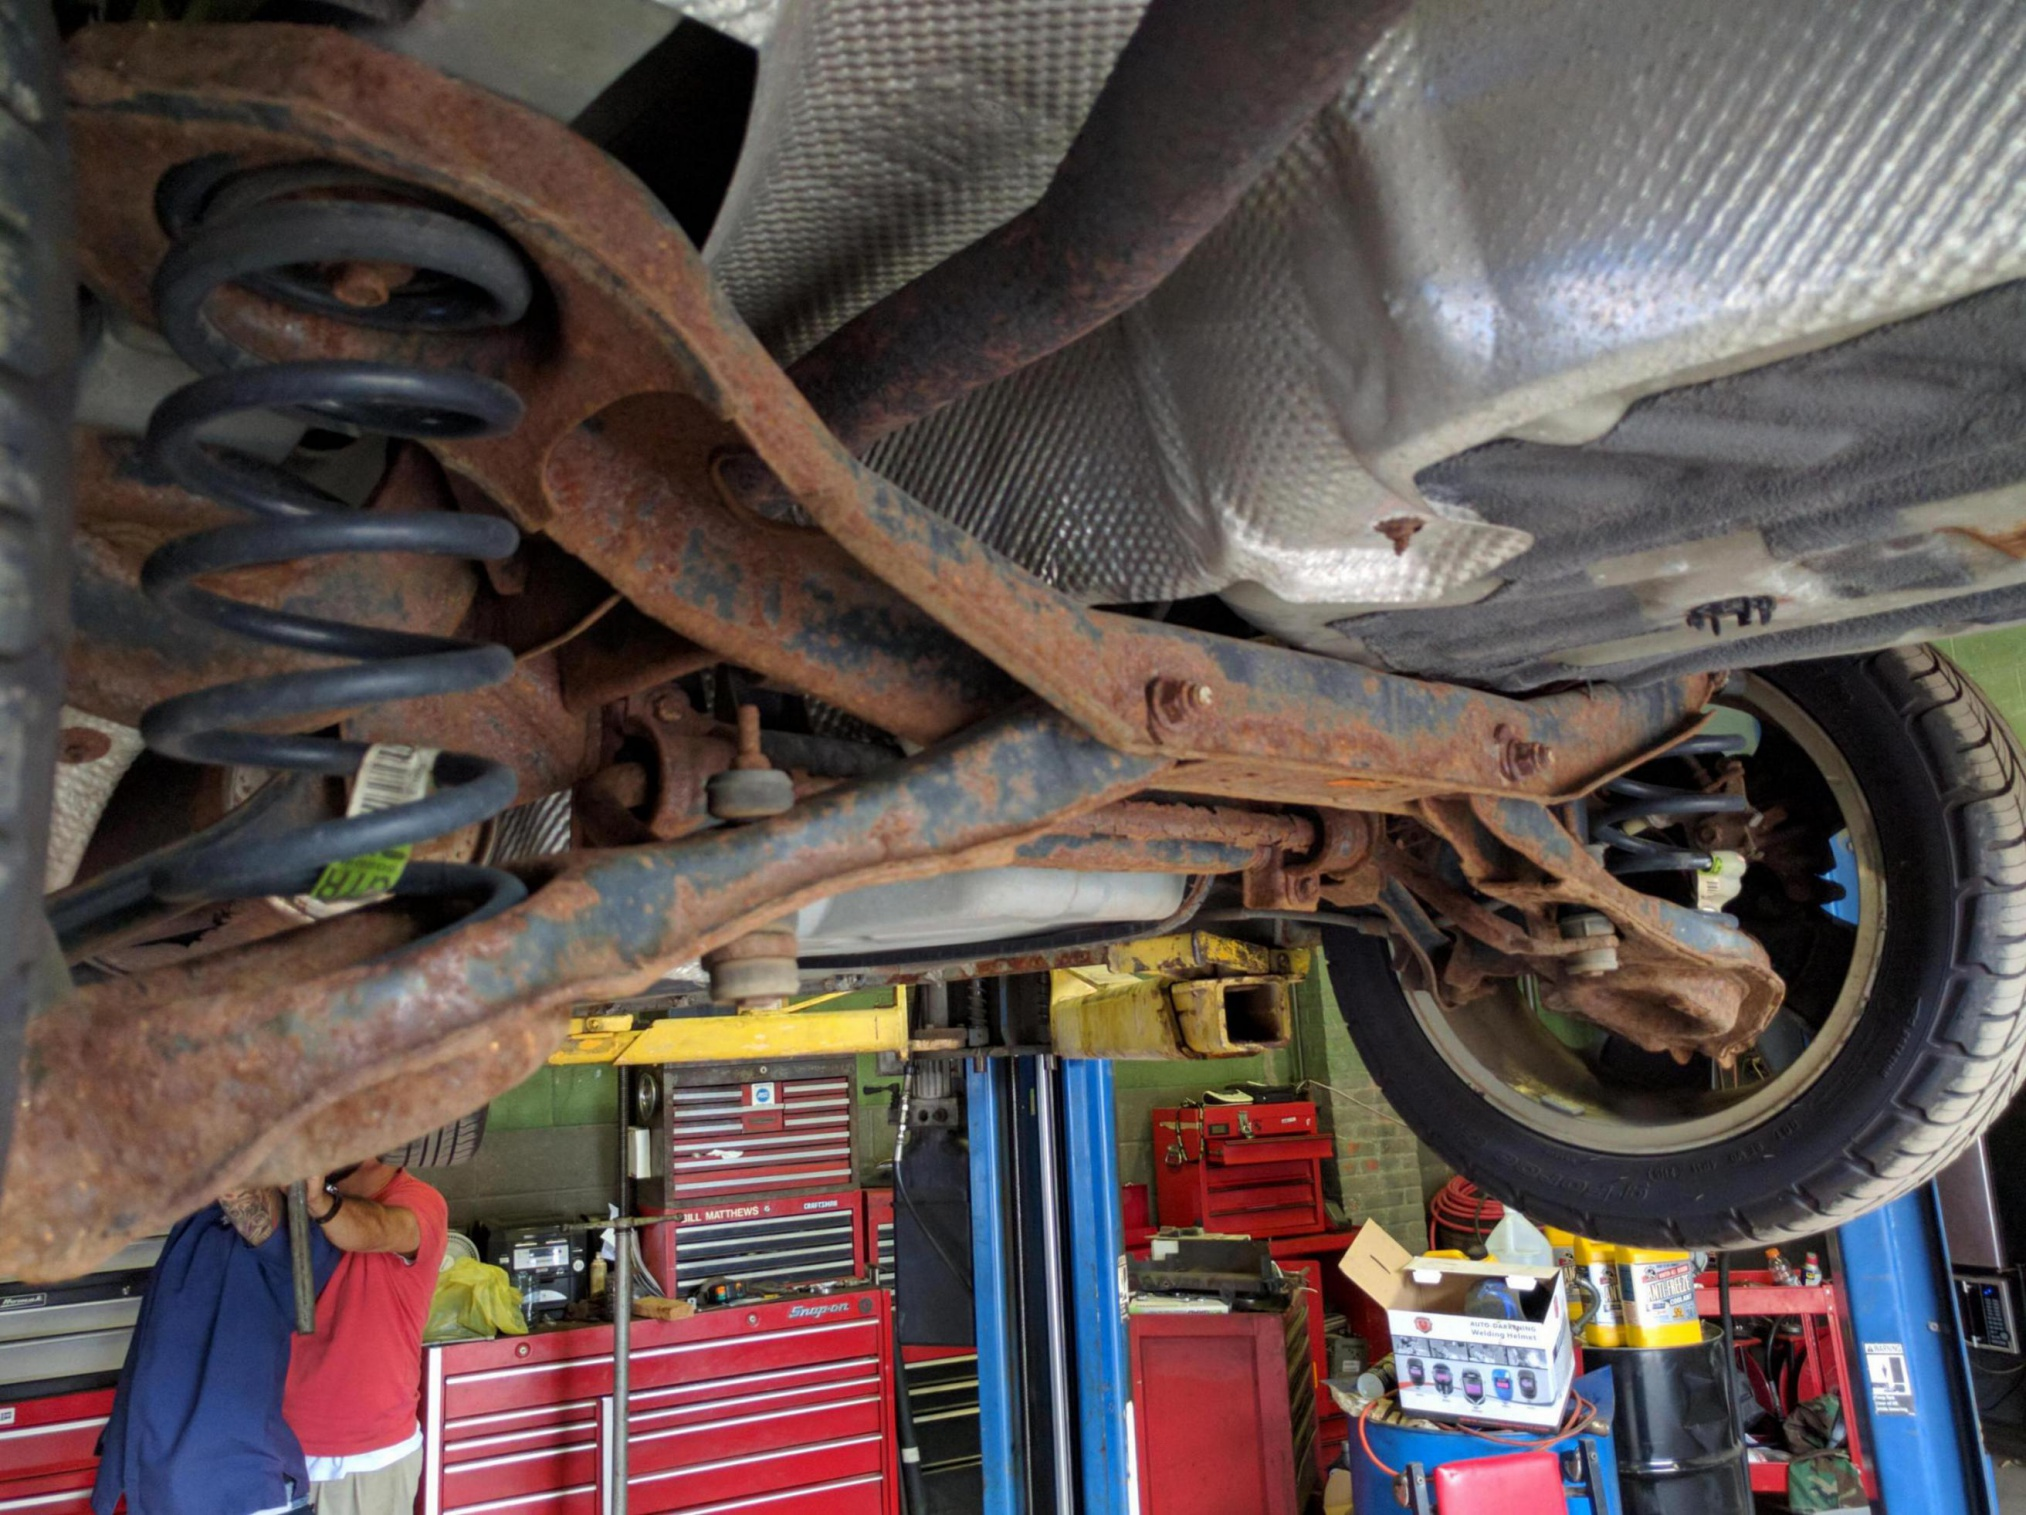 2005 zx4 rust on rear axle img_20160723_154336_1470928845063 jpg